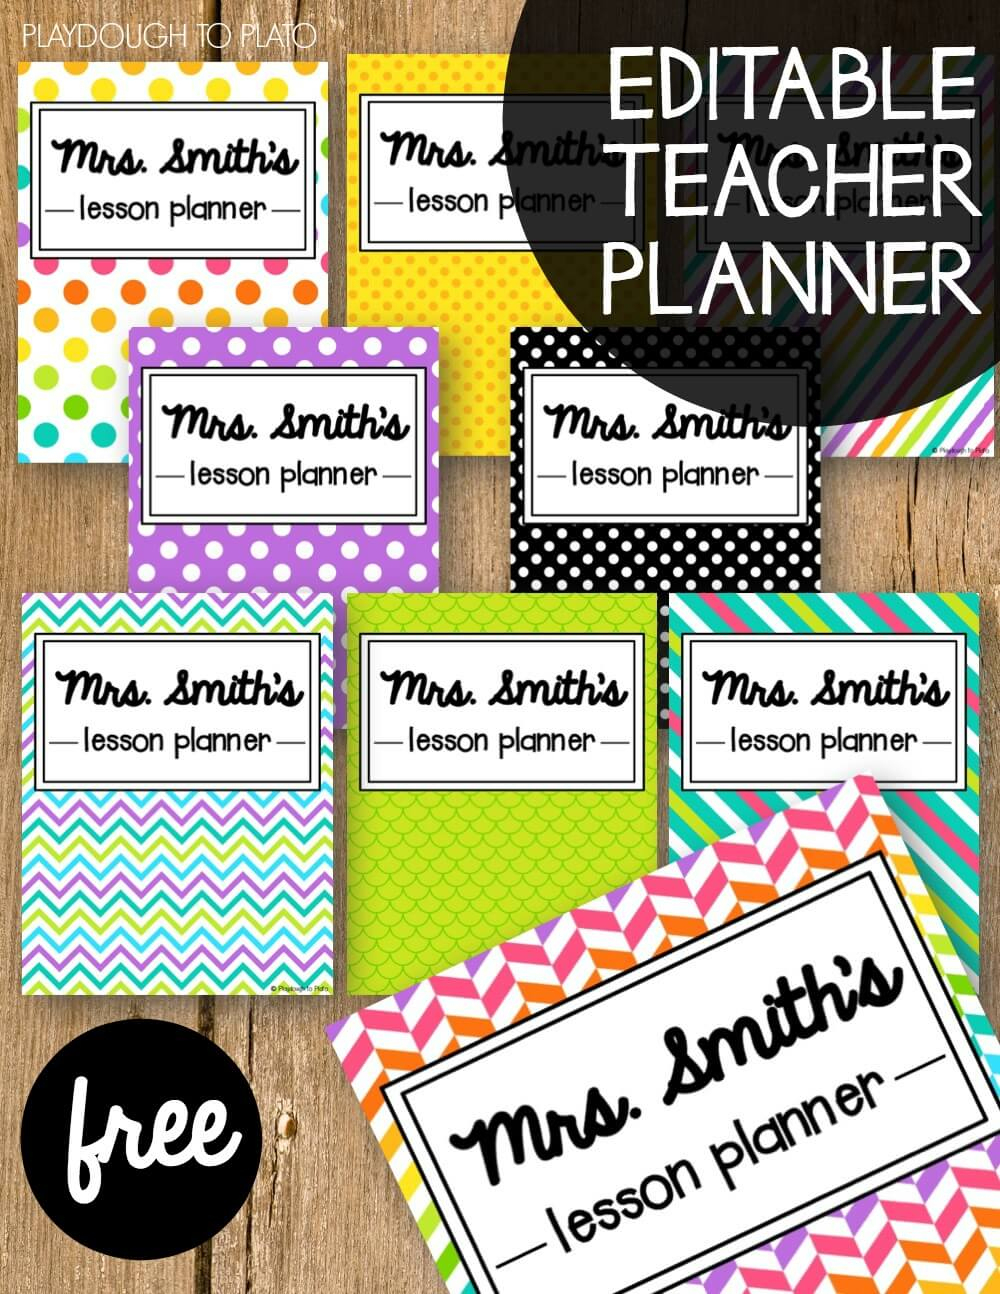 Free Teacher Planner - Playdough To Plato - Free Printable Teacher Planner Pages